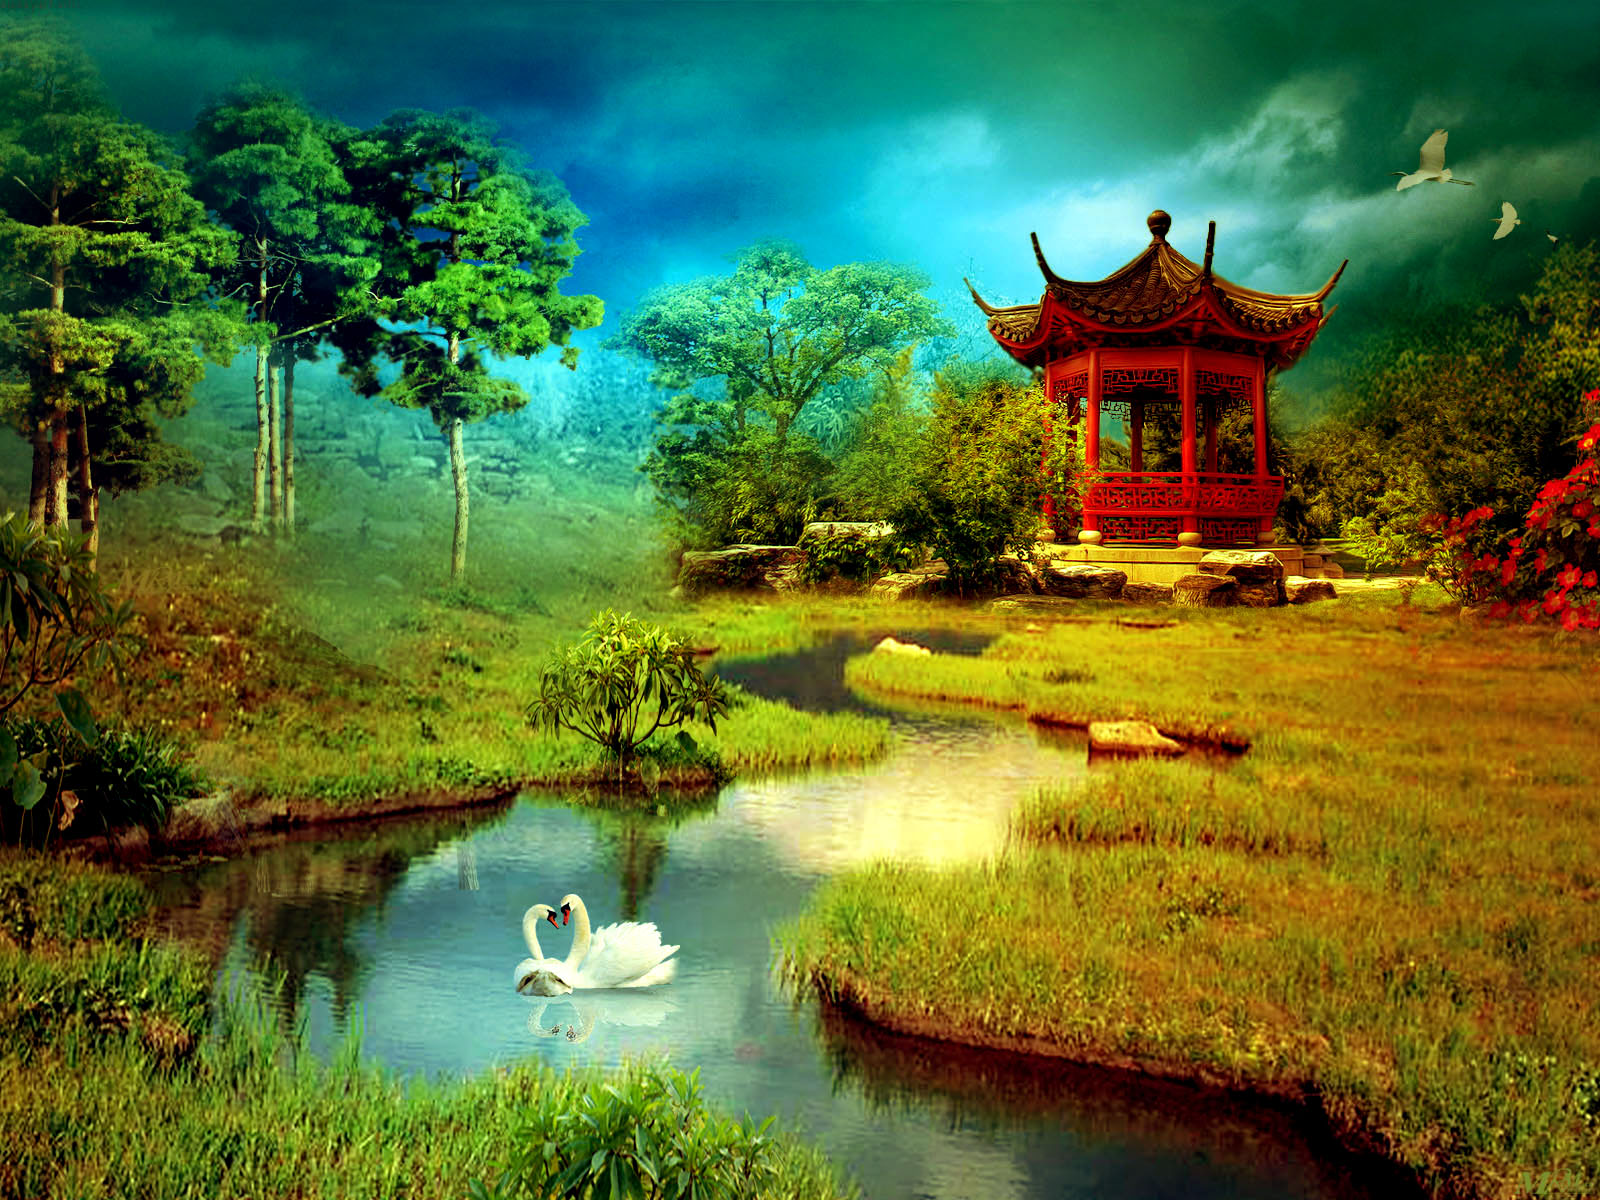 Nature digital art wallpapers 1600x1200 489598 for Exclusive 3d wallpaper